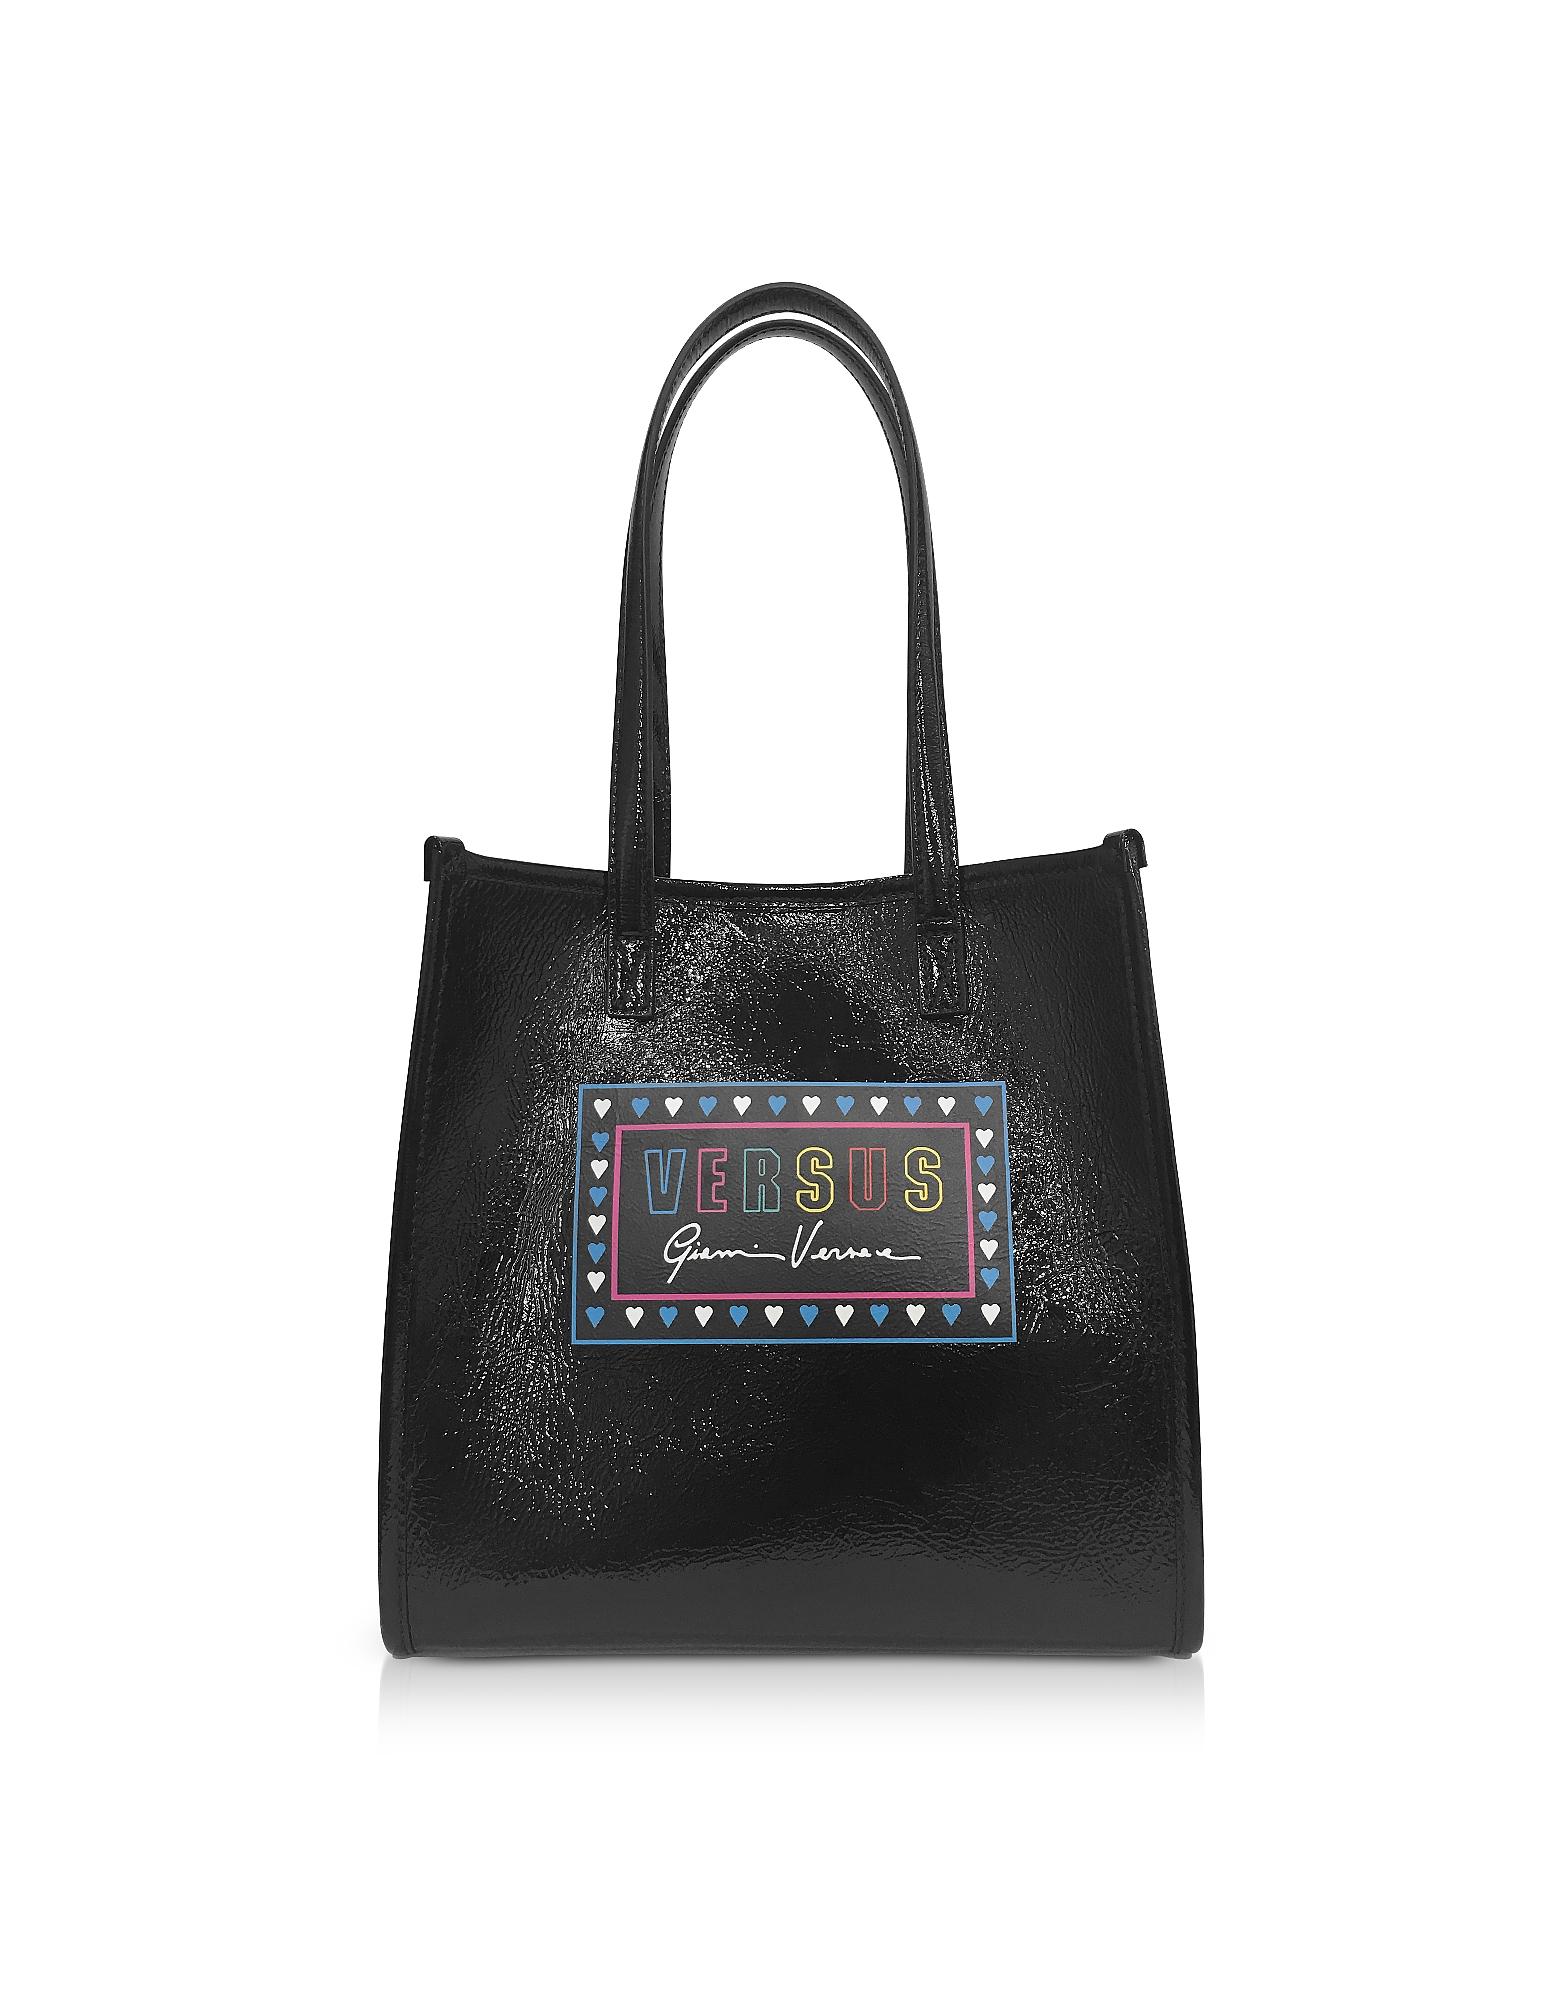 da01fb2de1ff8f Versace Versus Designer Handbags, Versus 90s Logo Naplak Tote Bag